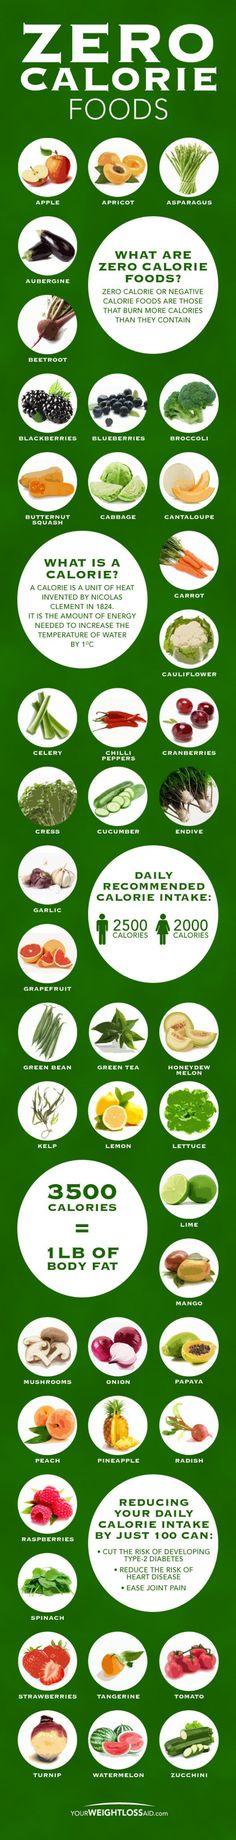 Healthy Options, Healthy Tips, Healthy Habits, Healthy Snacks, Healthy Recipes, Eating Healthy, Diet Recipes, Healthy Weight, Healthy Women